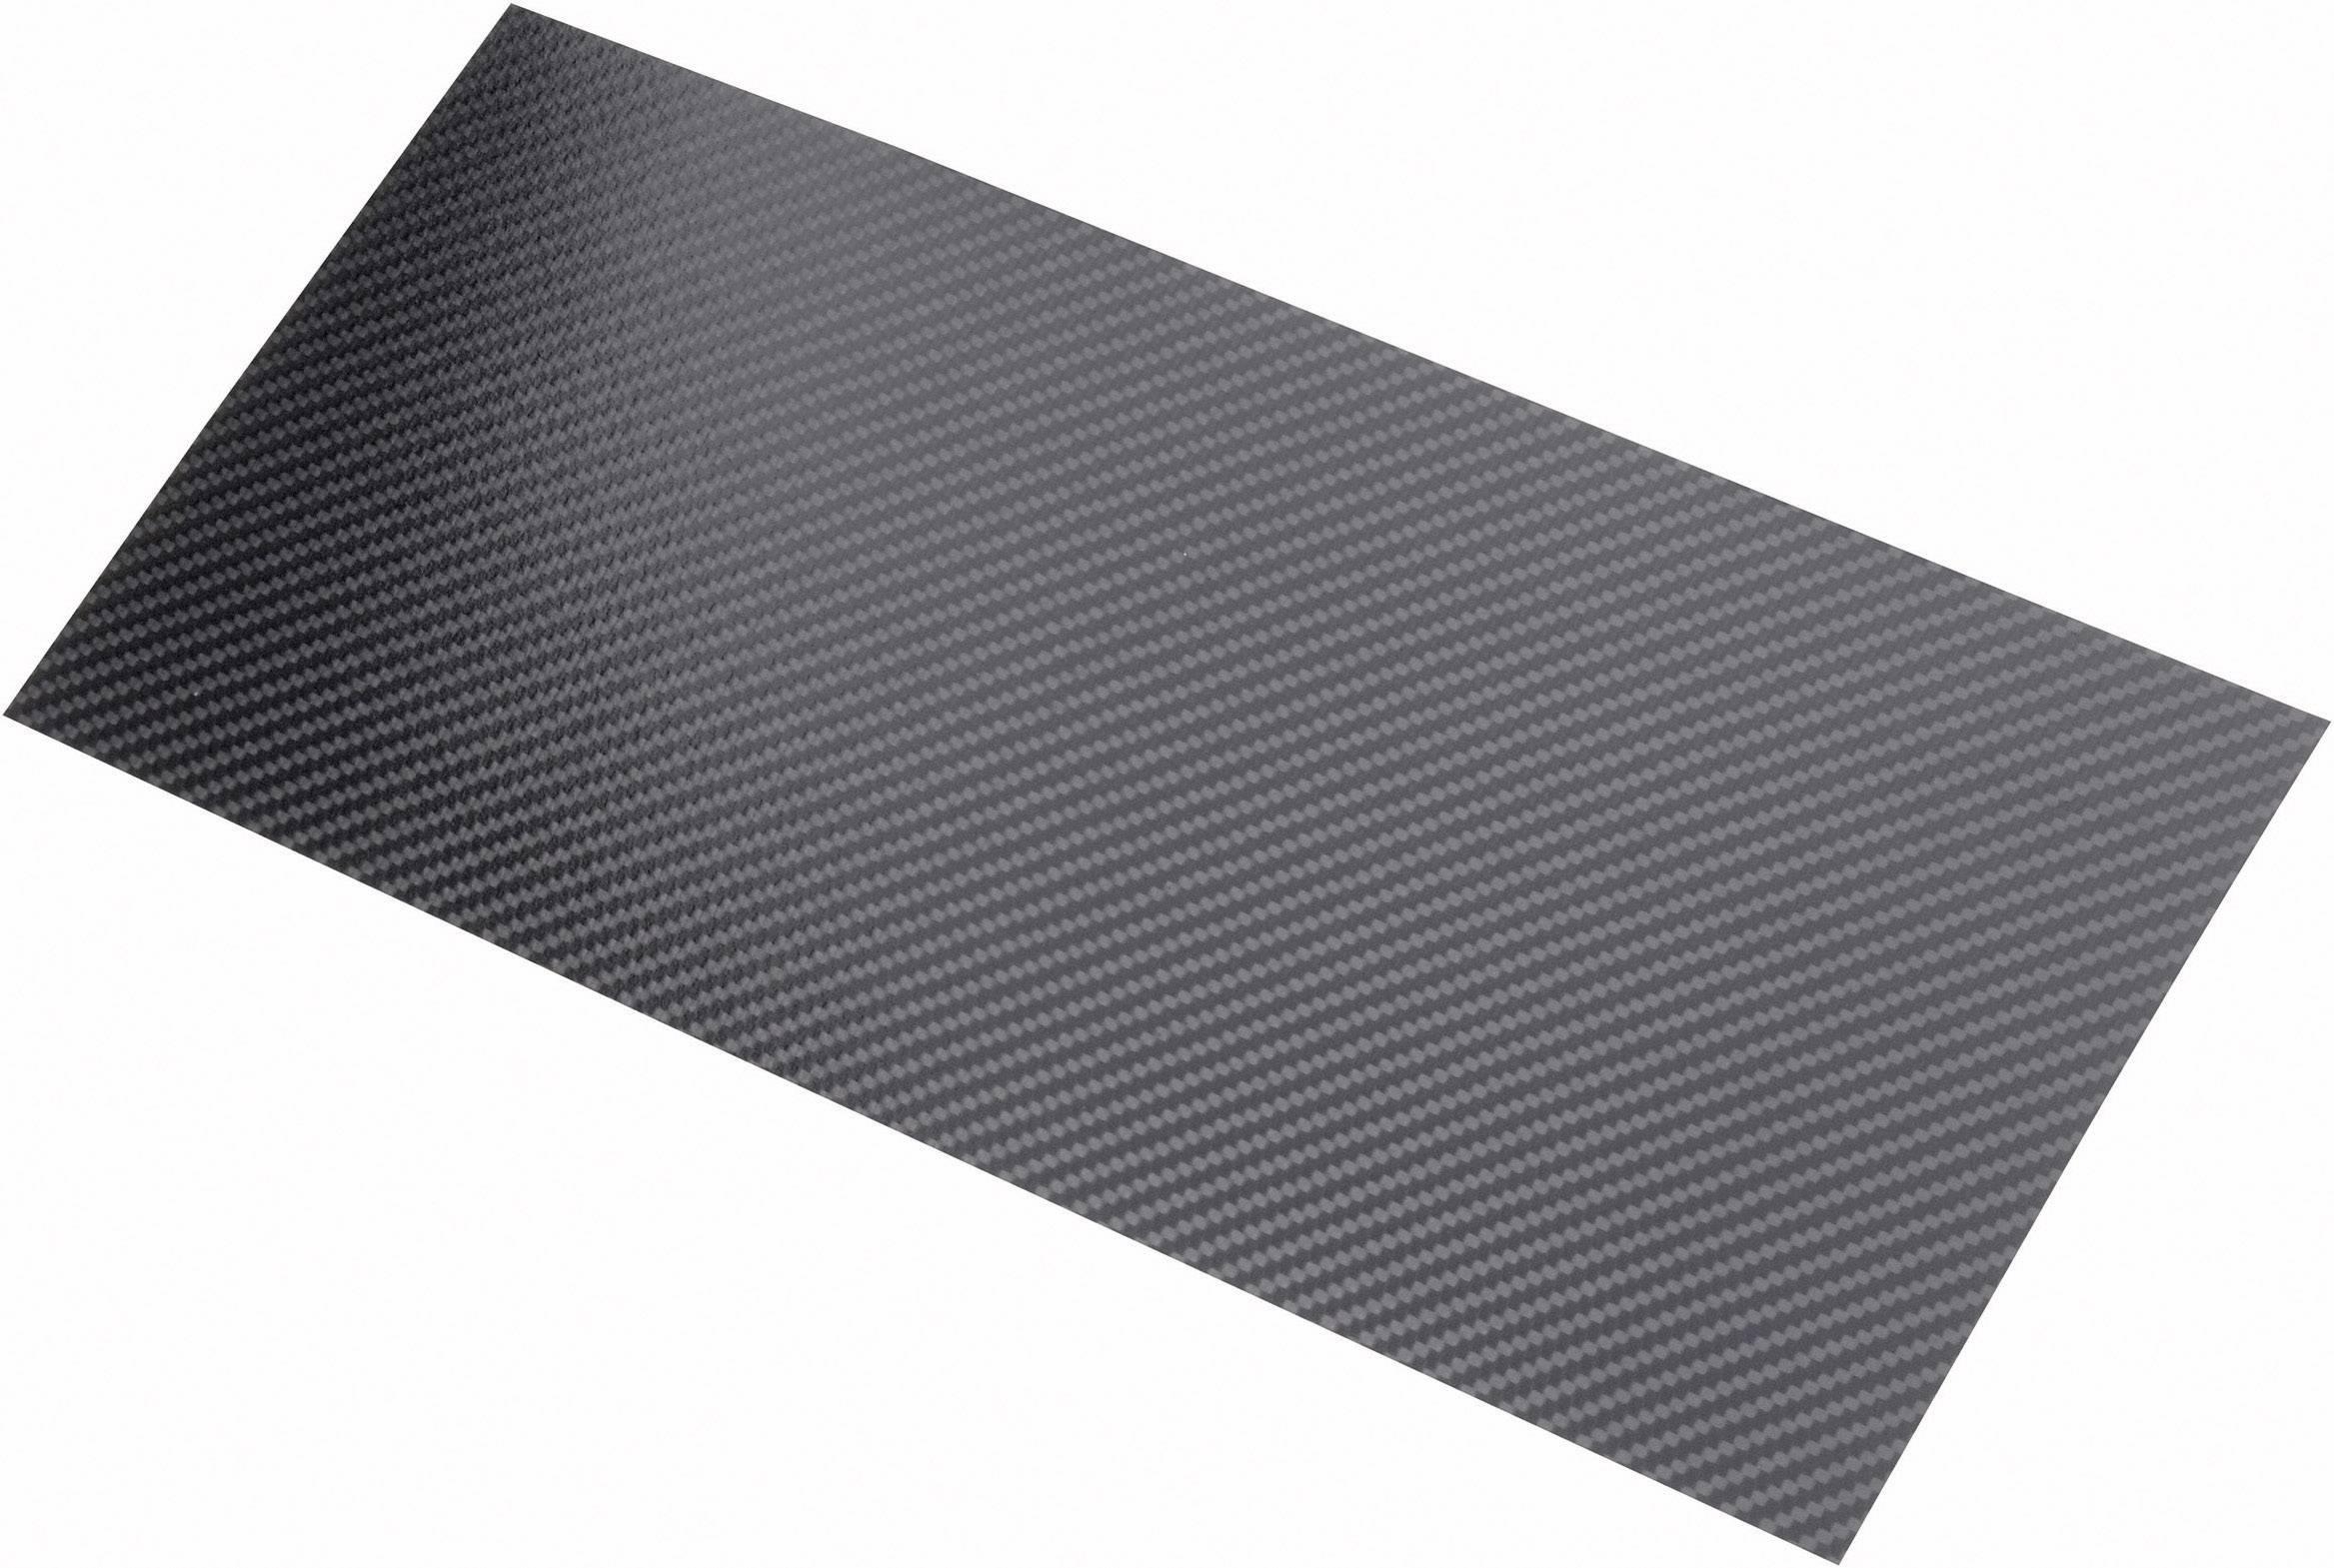 Doska z karbónových vlákien Carbotec 231664, (d x š) 340 mm x 150 mm x 0.55 mm